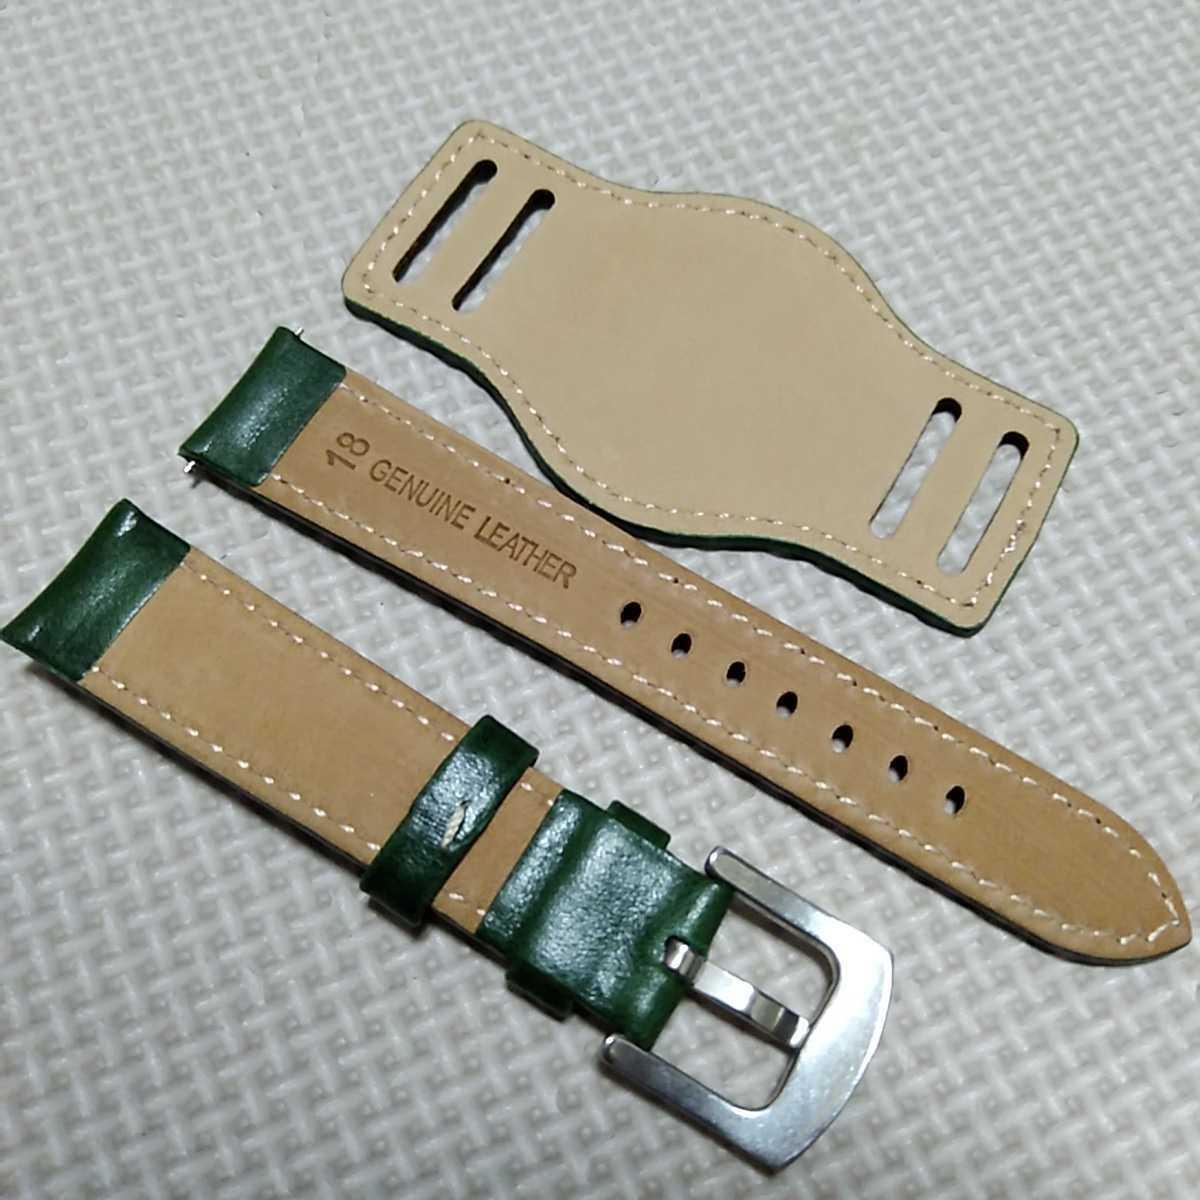 No52 ブンド BUND 本革レザーベルト 腕時計ベルト 交換用ストラップ グリーン 18mm 未使用 高品質 ドイツパイロット 空軍_画像4